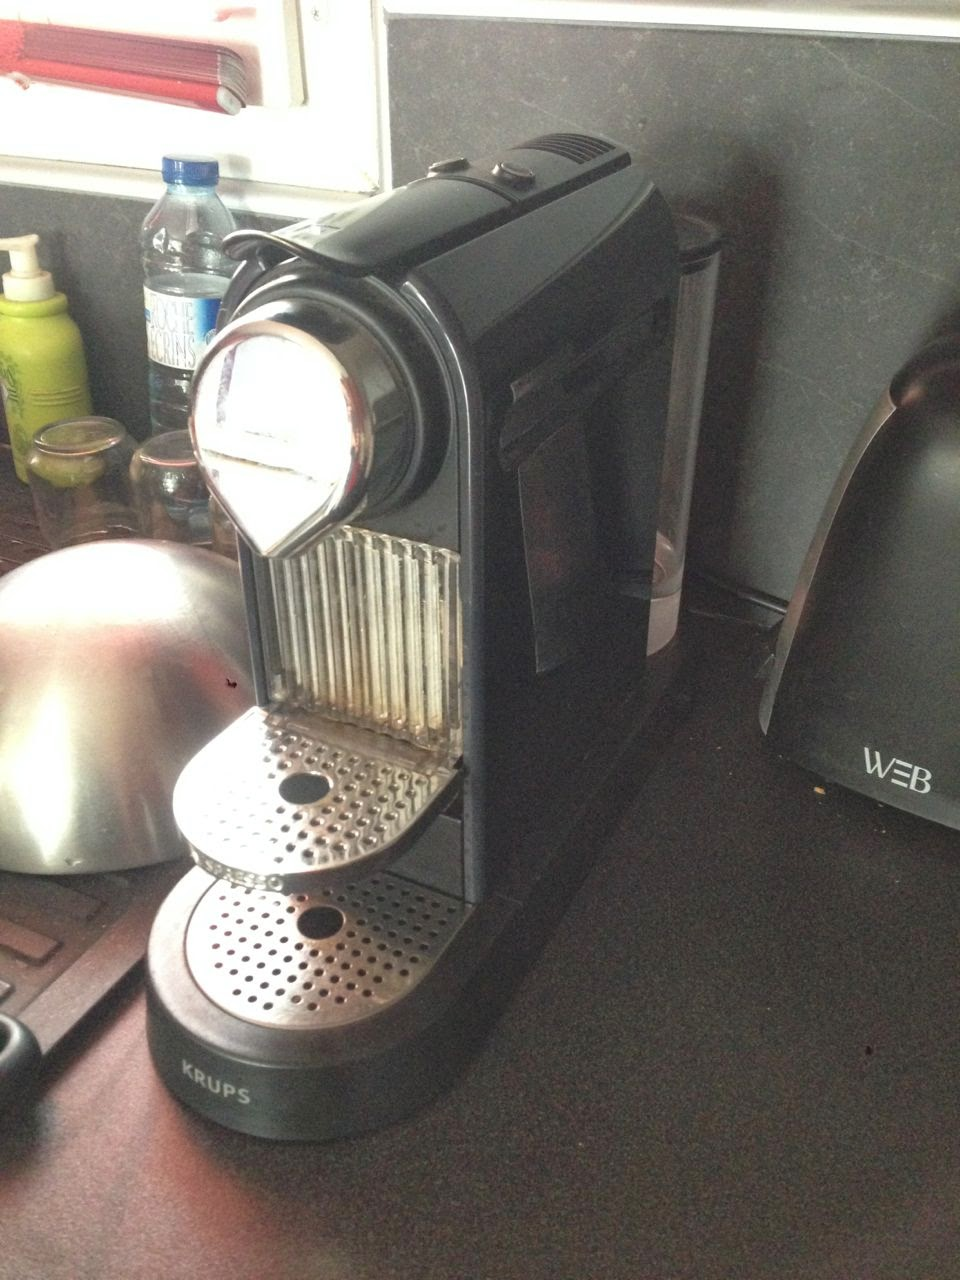 cafetiere nespresso qui fuit. Black Bedroom Furniture Sets. Home Design Ideas